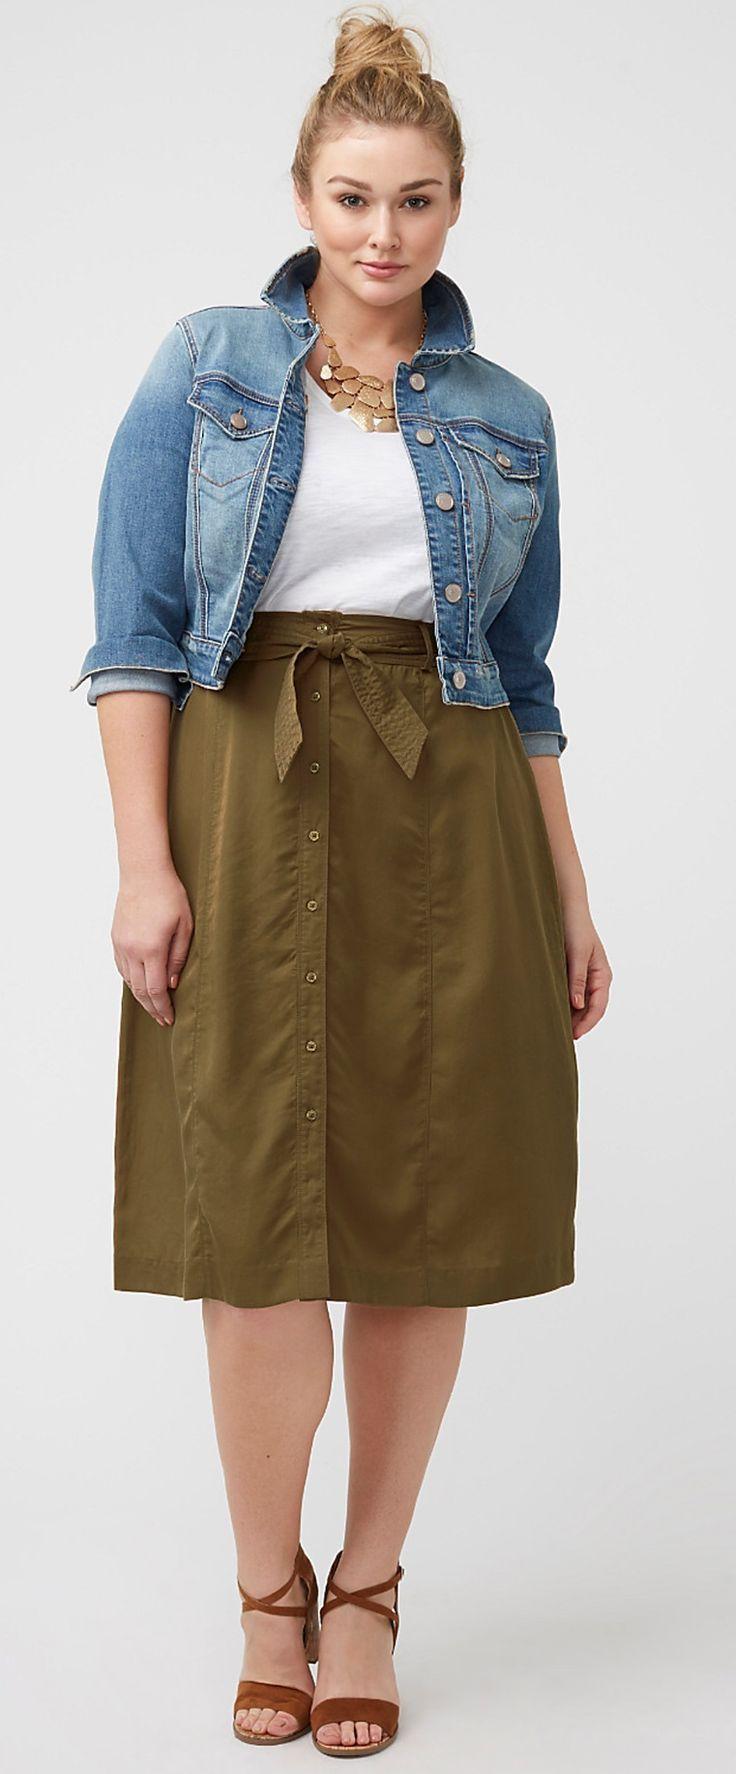 cool Lane Bryant - Lane Bryant Button-front skirt by http://www.globalfashionista.xyz/plus-size-fashion/lane-bryant-lane-bryant-button-front-skirt/